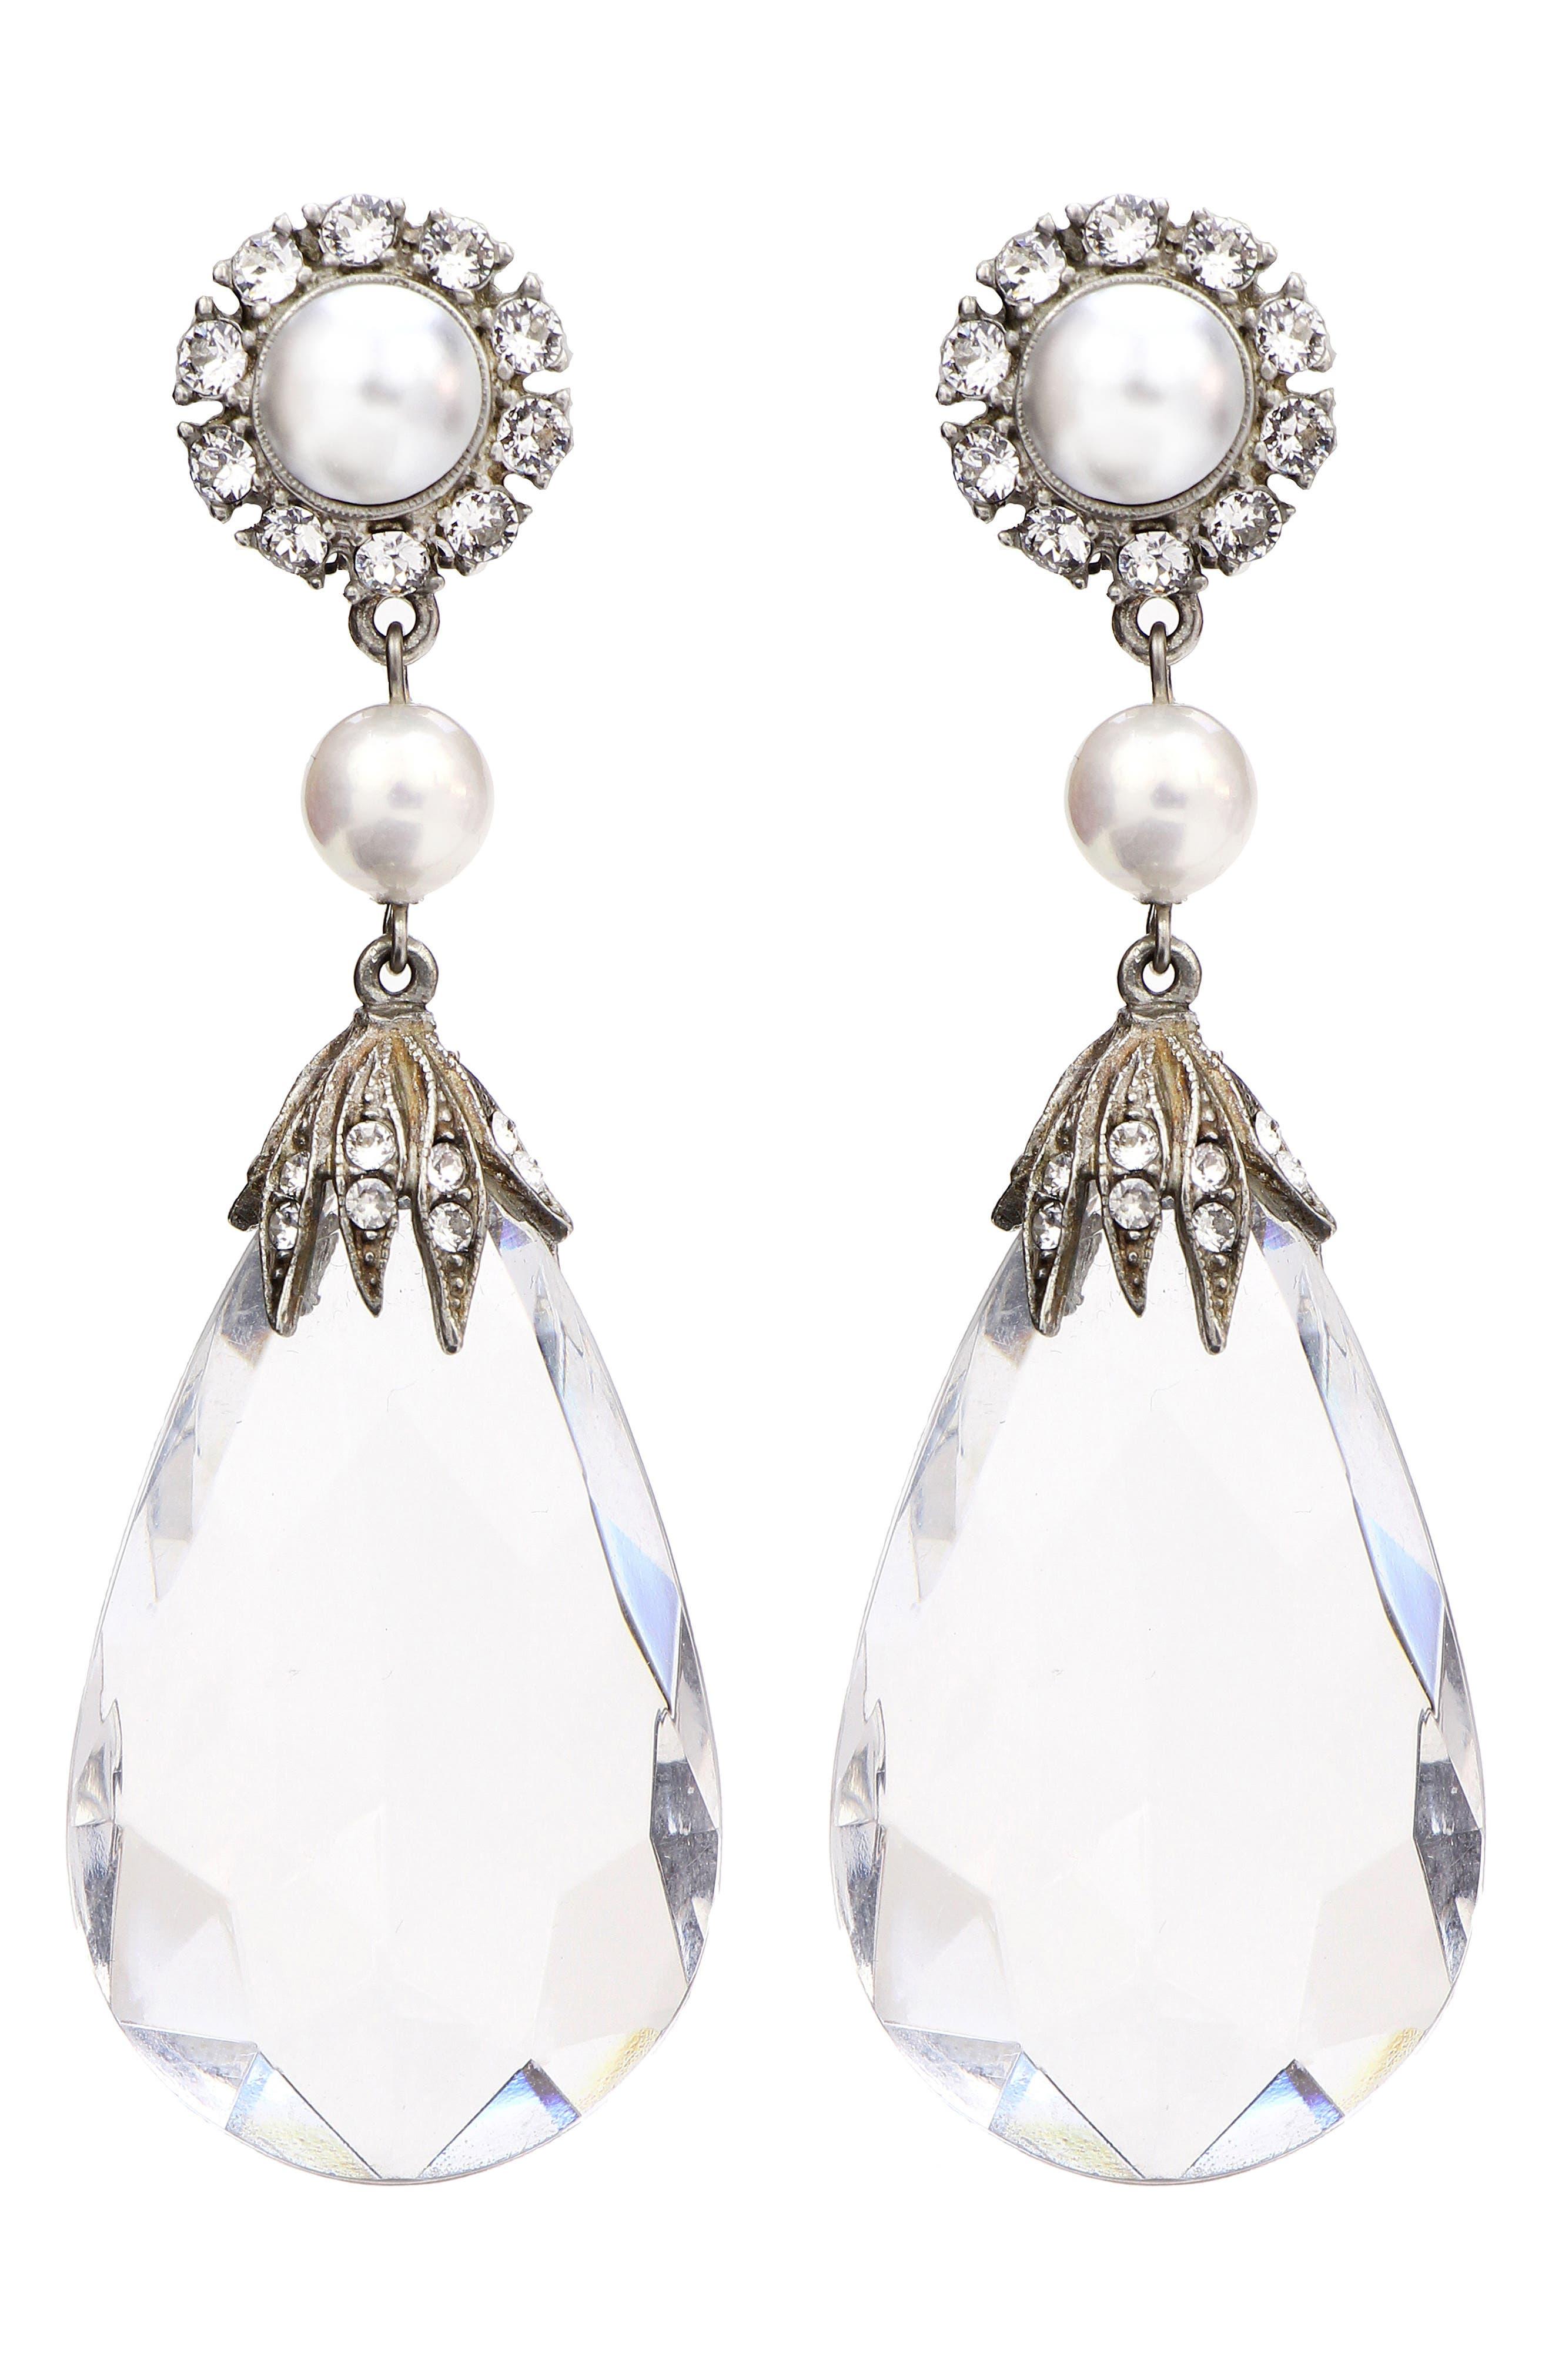 Imitation Pearl & Crystal Clip Earrings,                             Main thumbnail 1, color,                             Clear/ Silver